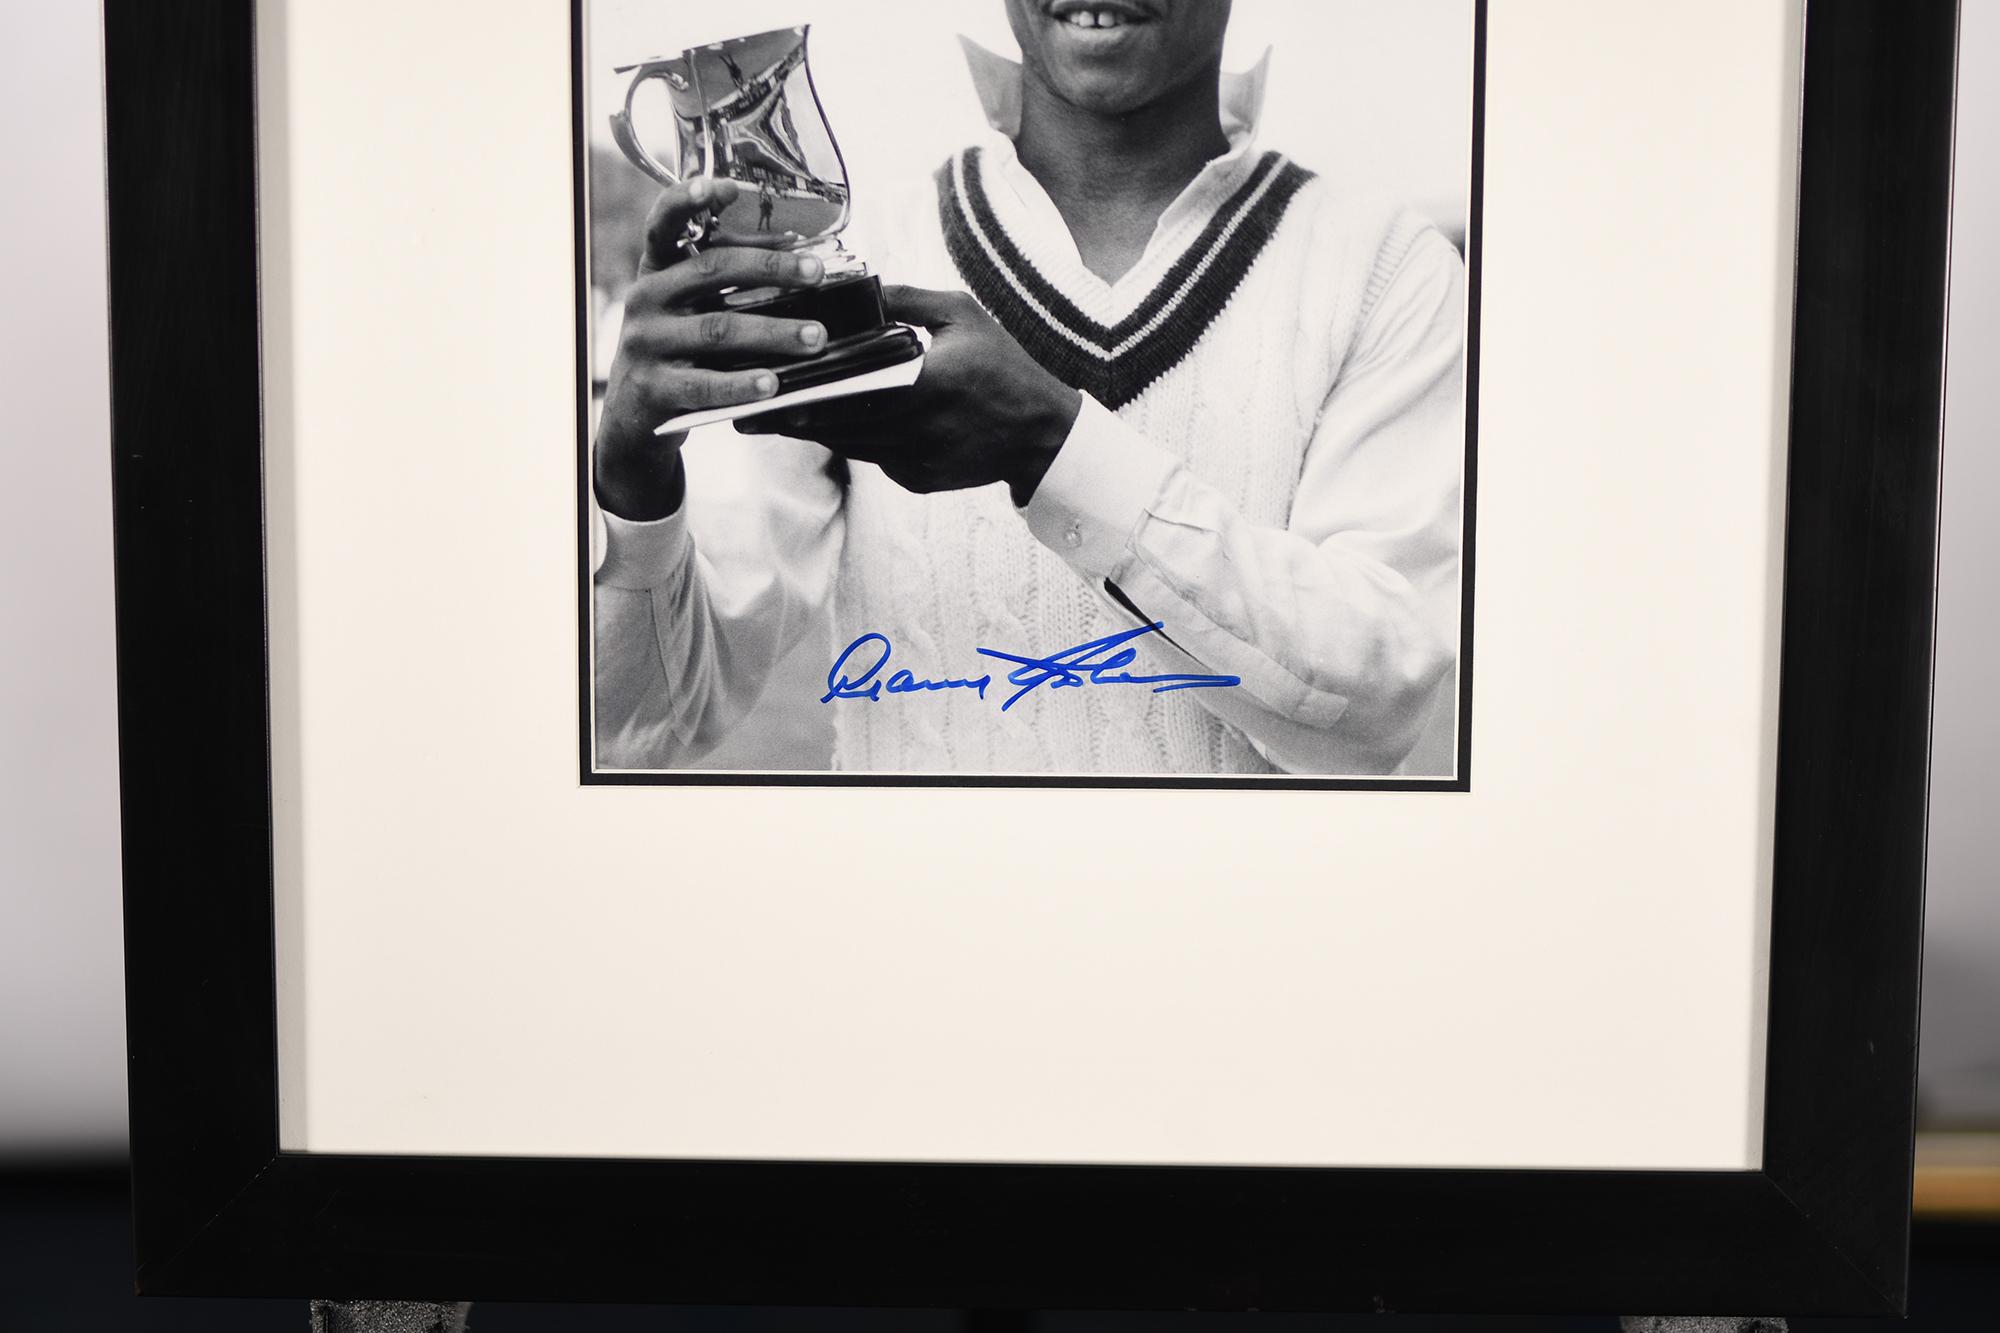 Gary Sobers Framed Signature Presentation - Image 3 of 3